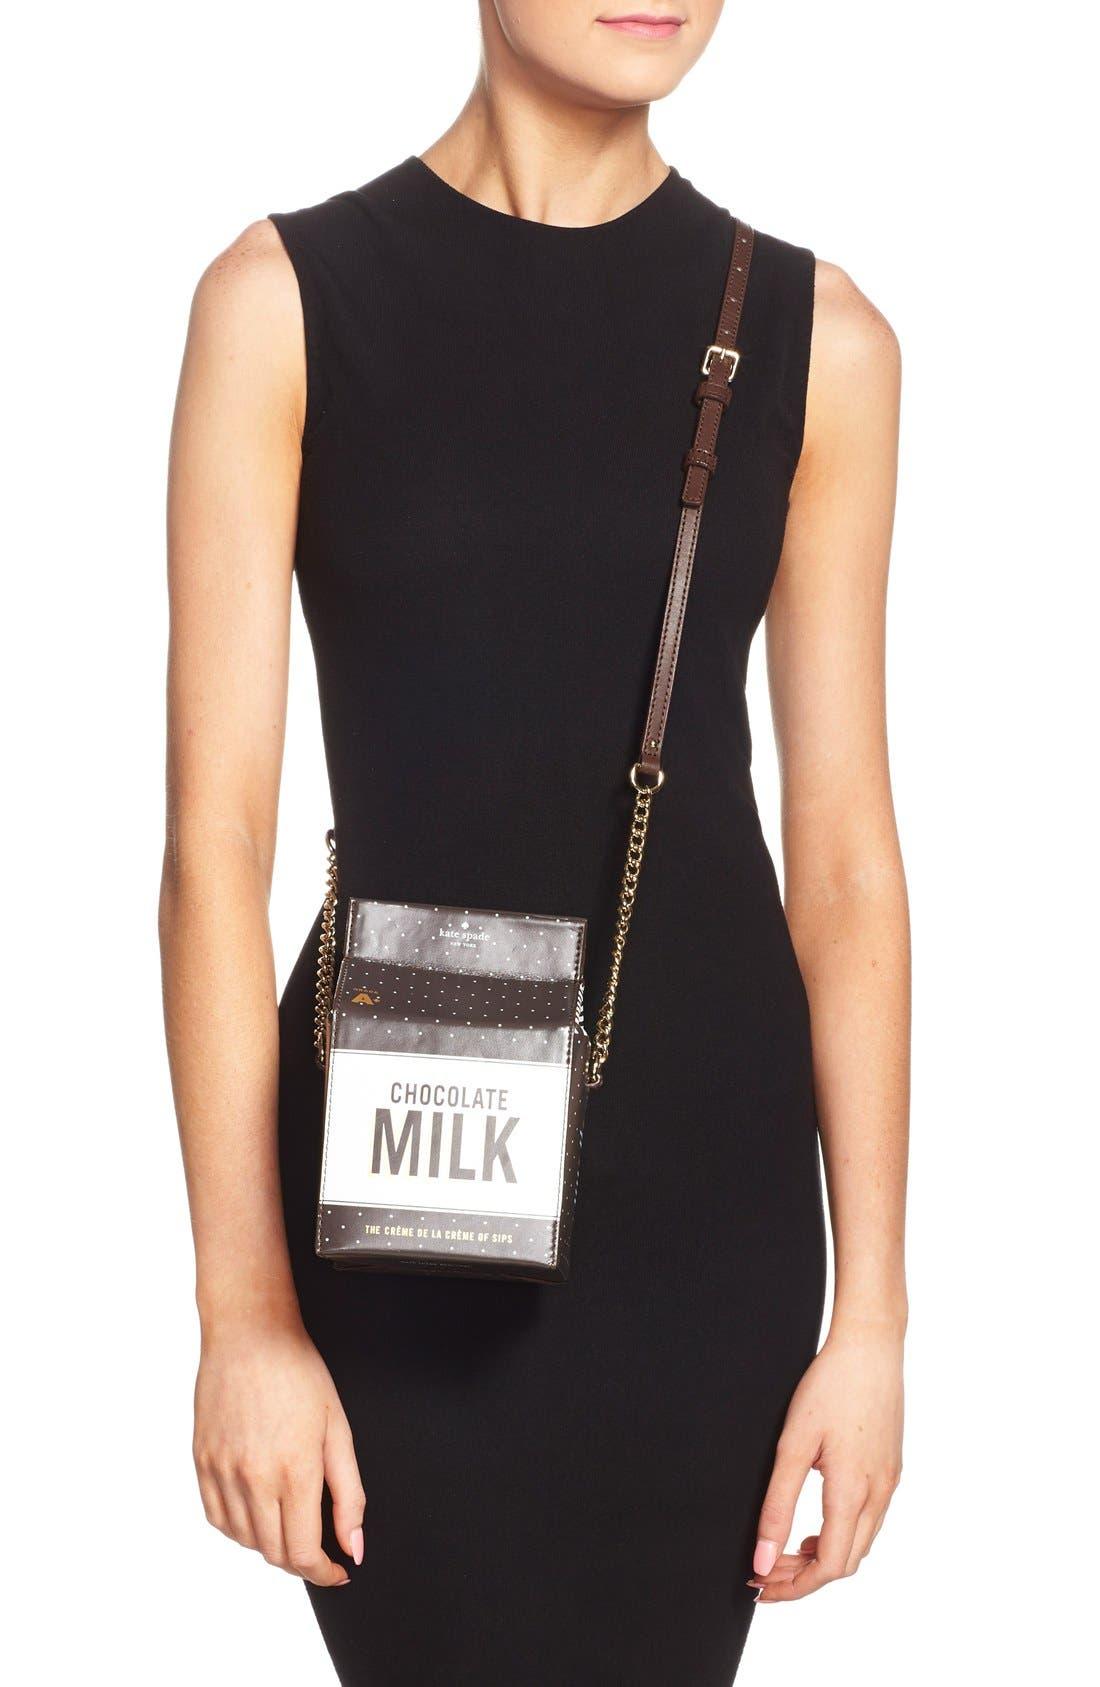 KATE SPADE NEW YORK,                             'de la crème' milk container crossbody bag,                             Alternate thumbnail 5, color,                             974